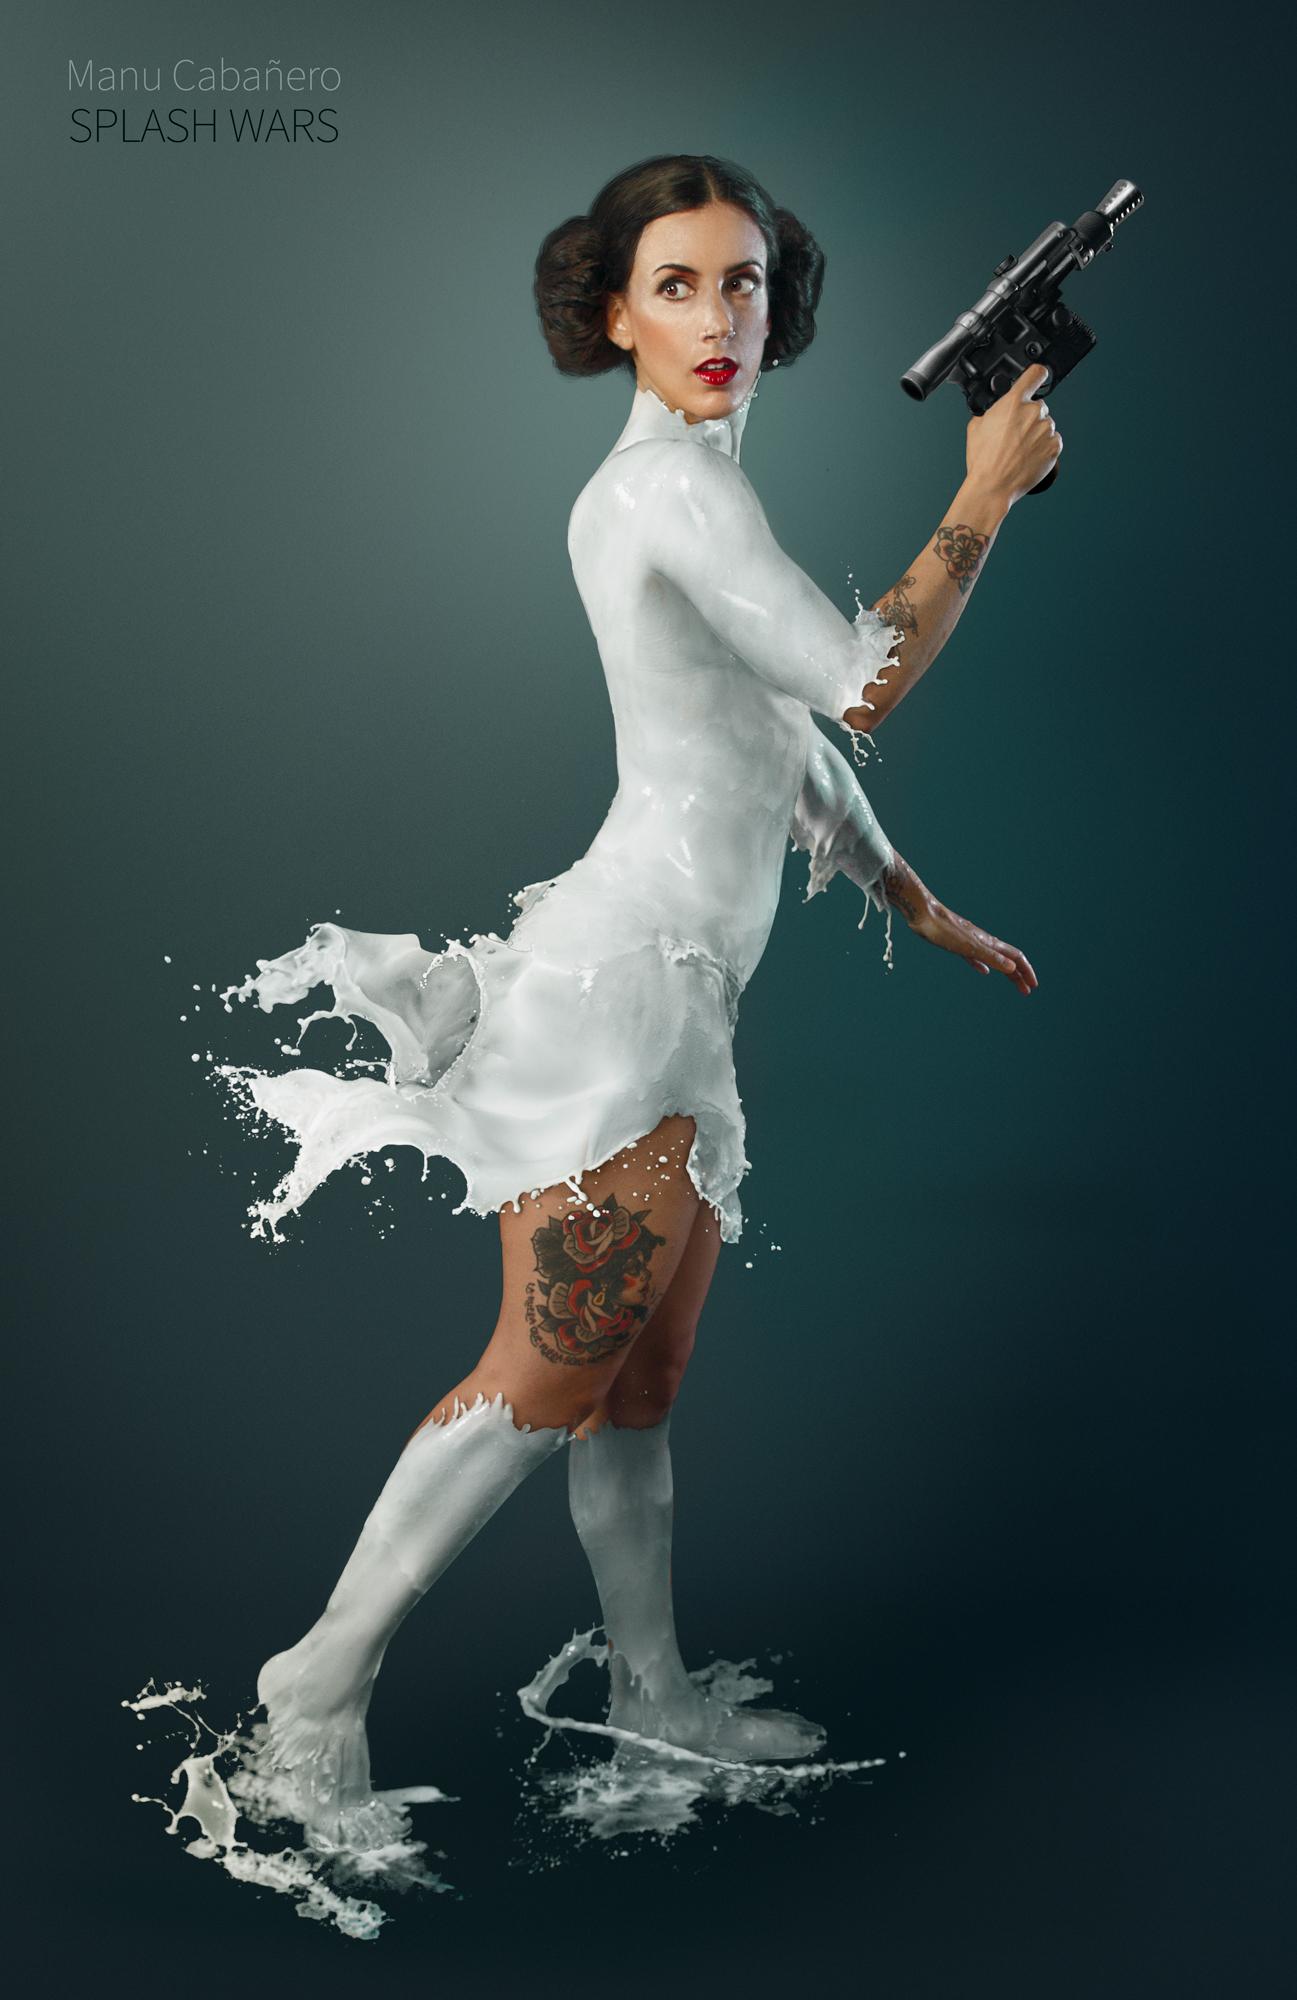 Splash Wars Creates Star Wars Characters Using Milk and Models